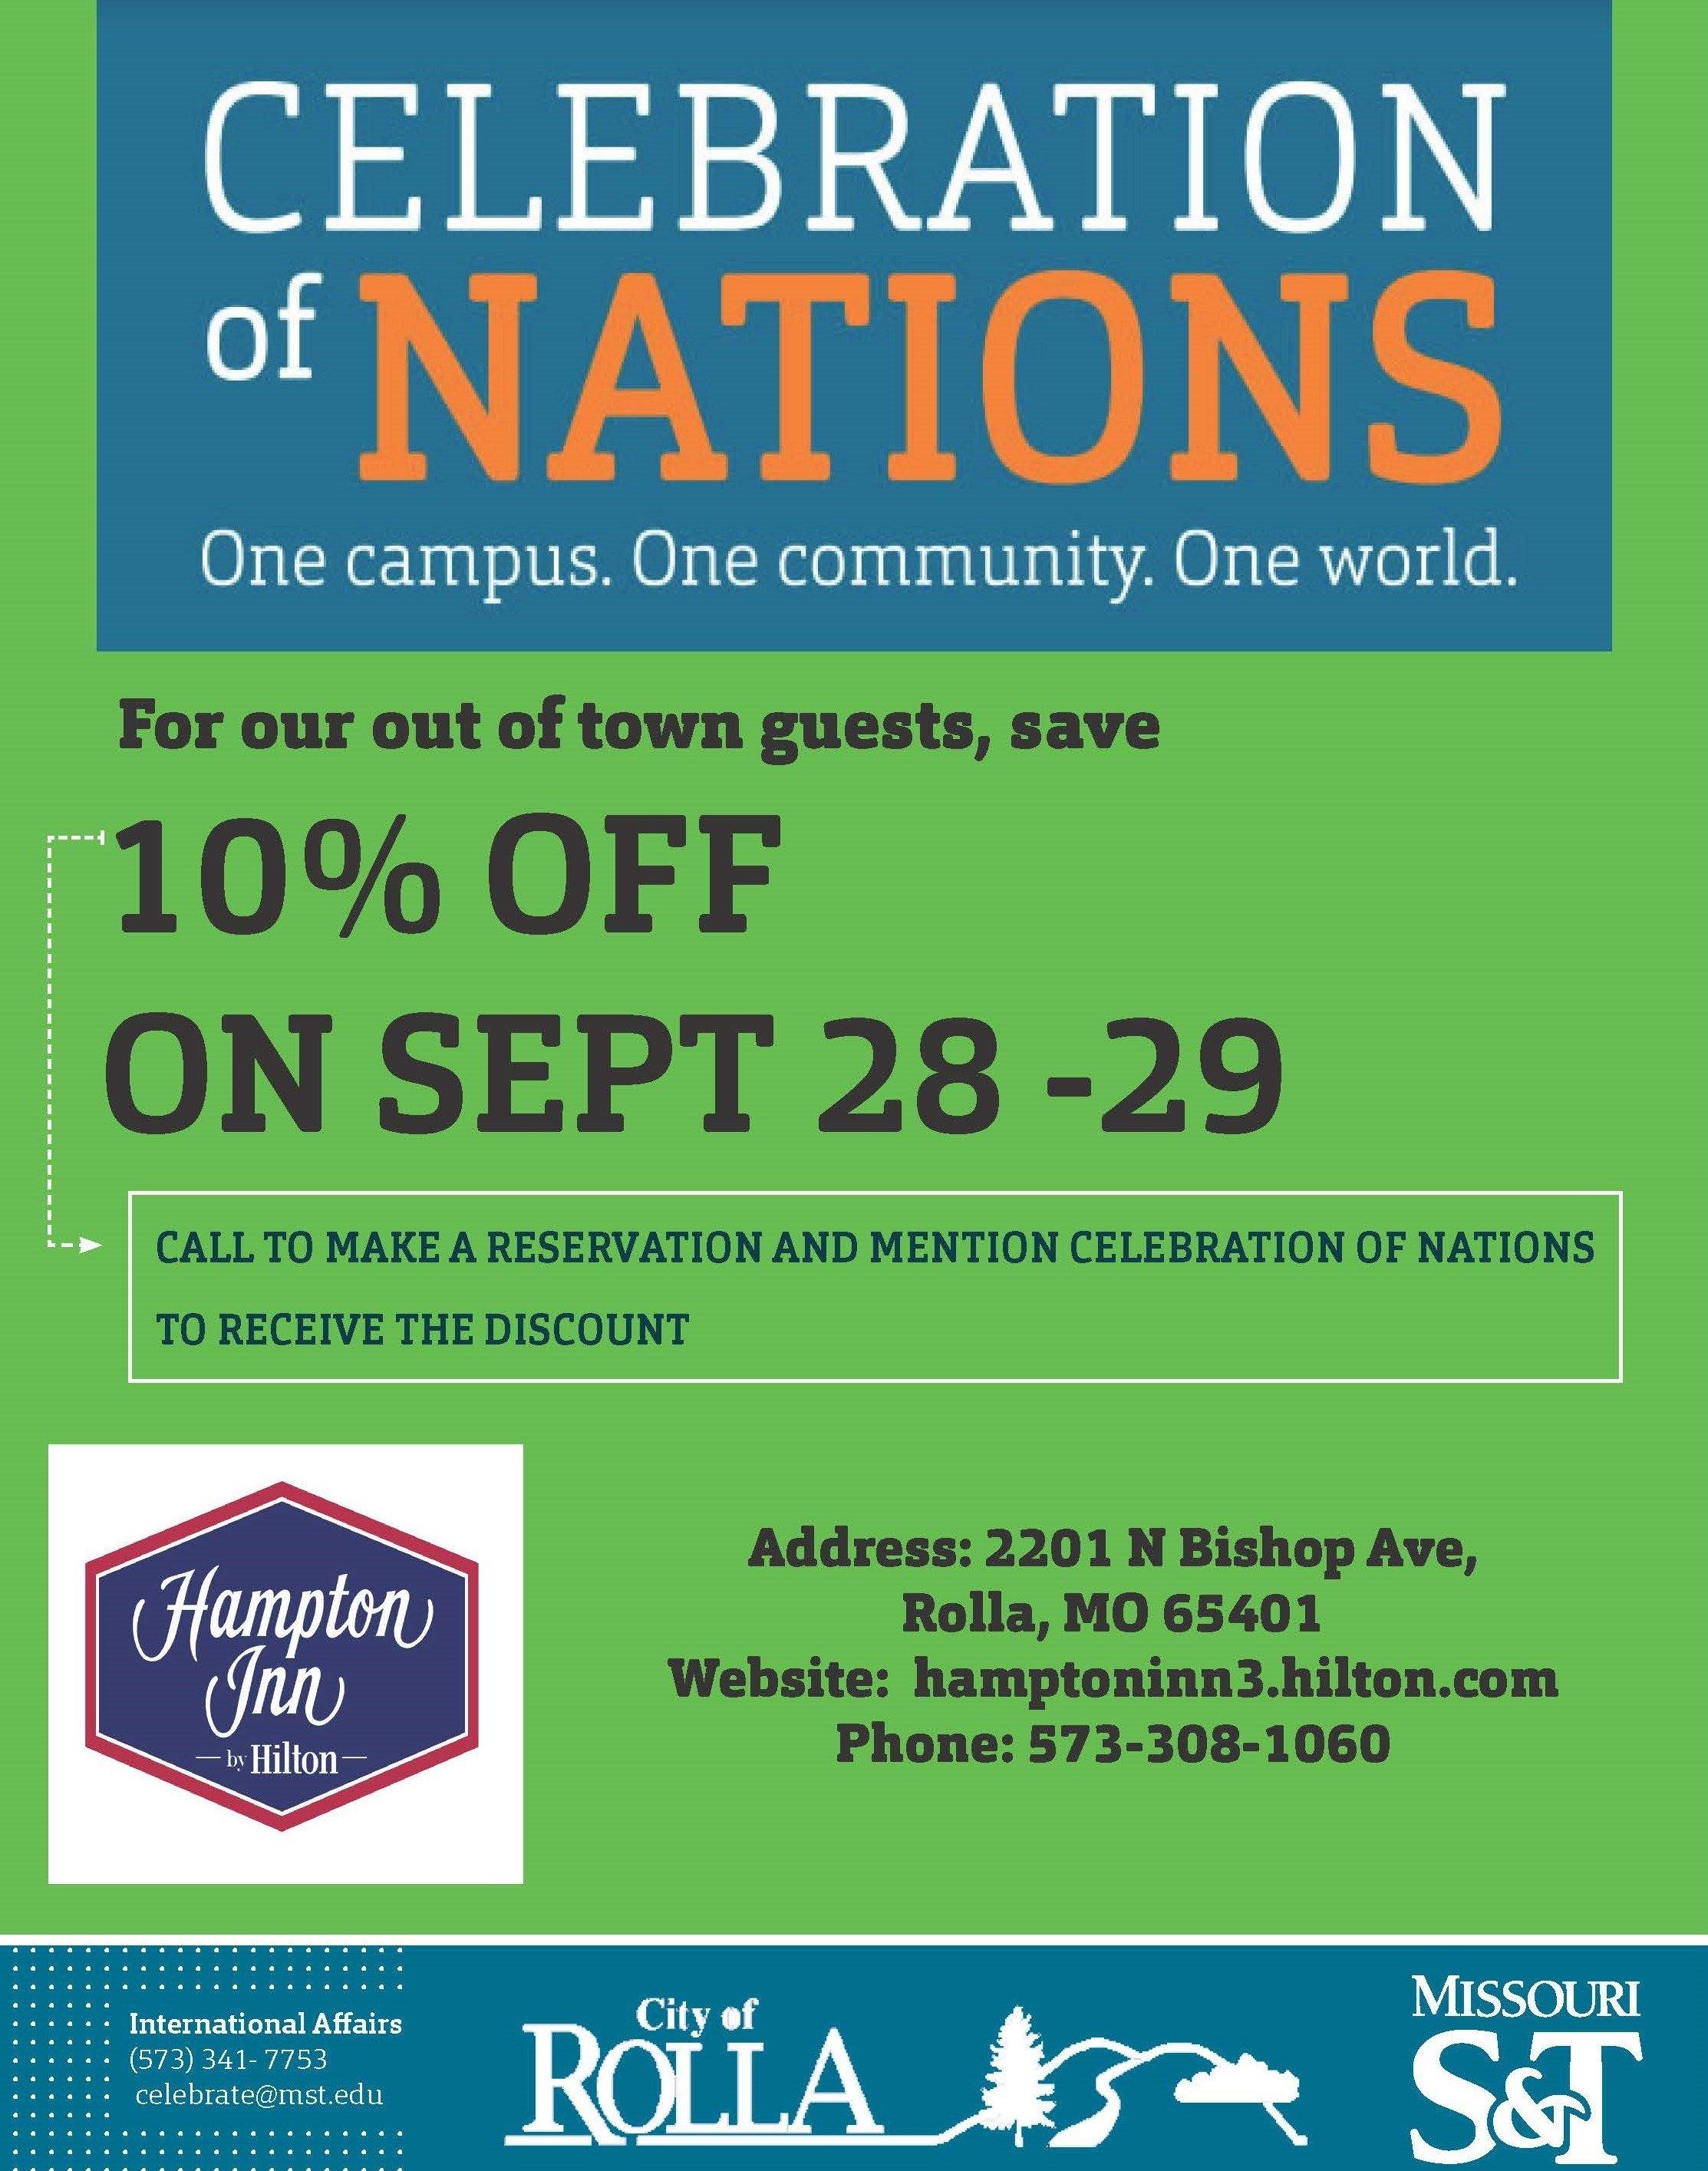 Celebration Of Nations – Celebration Of Nations   Missouri S&t Missouri S&t Calendar 2019